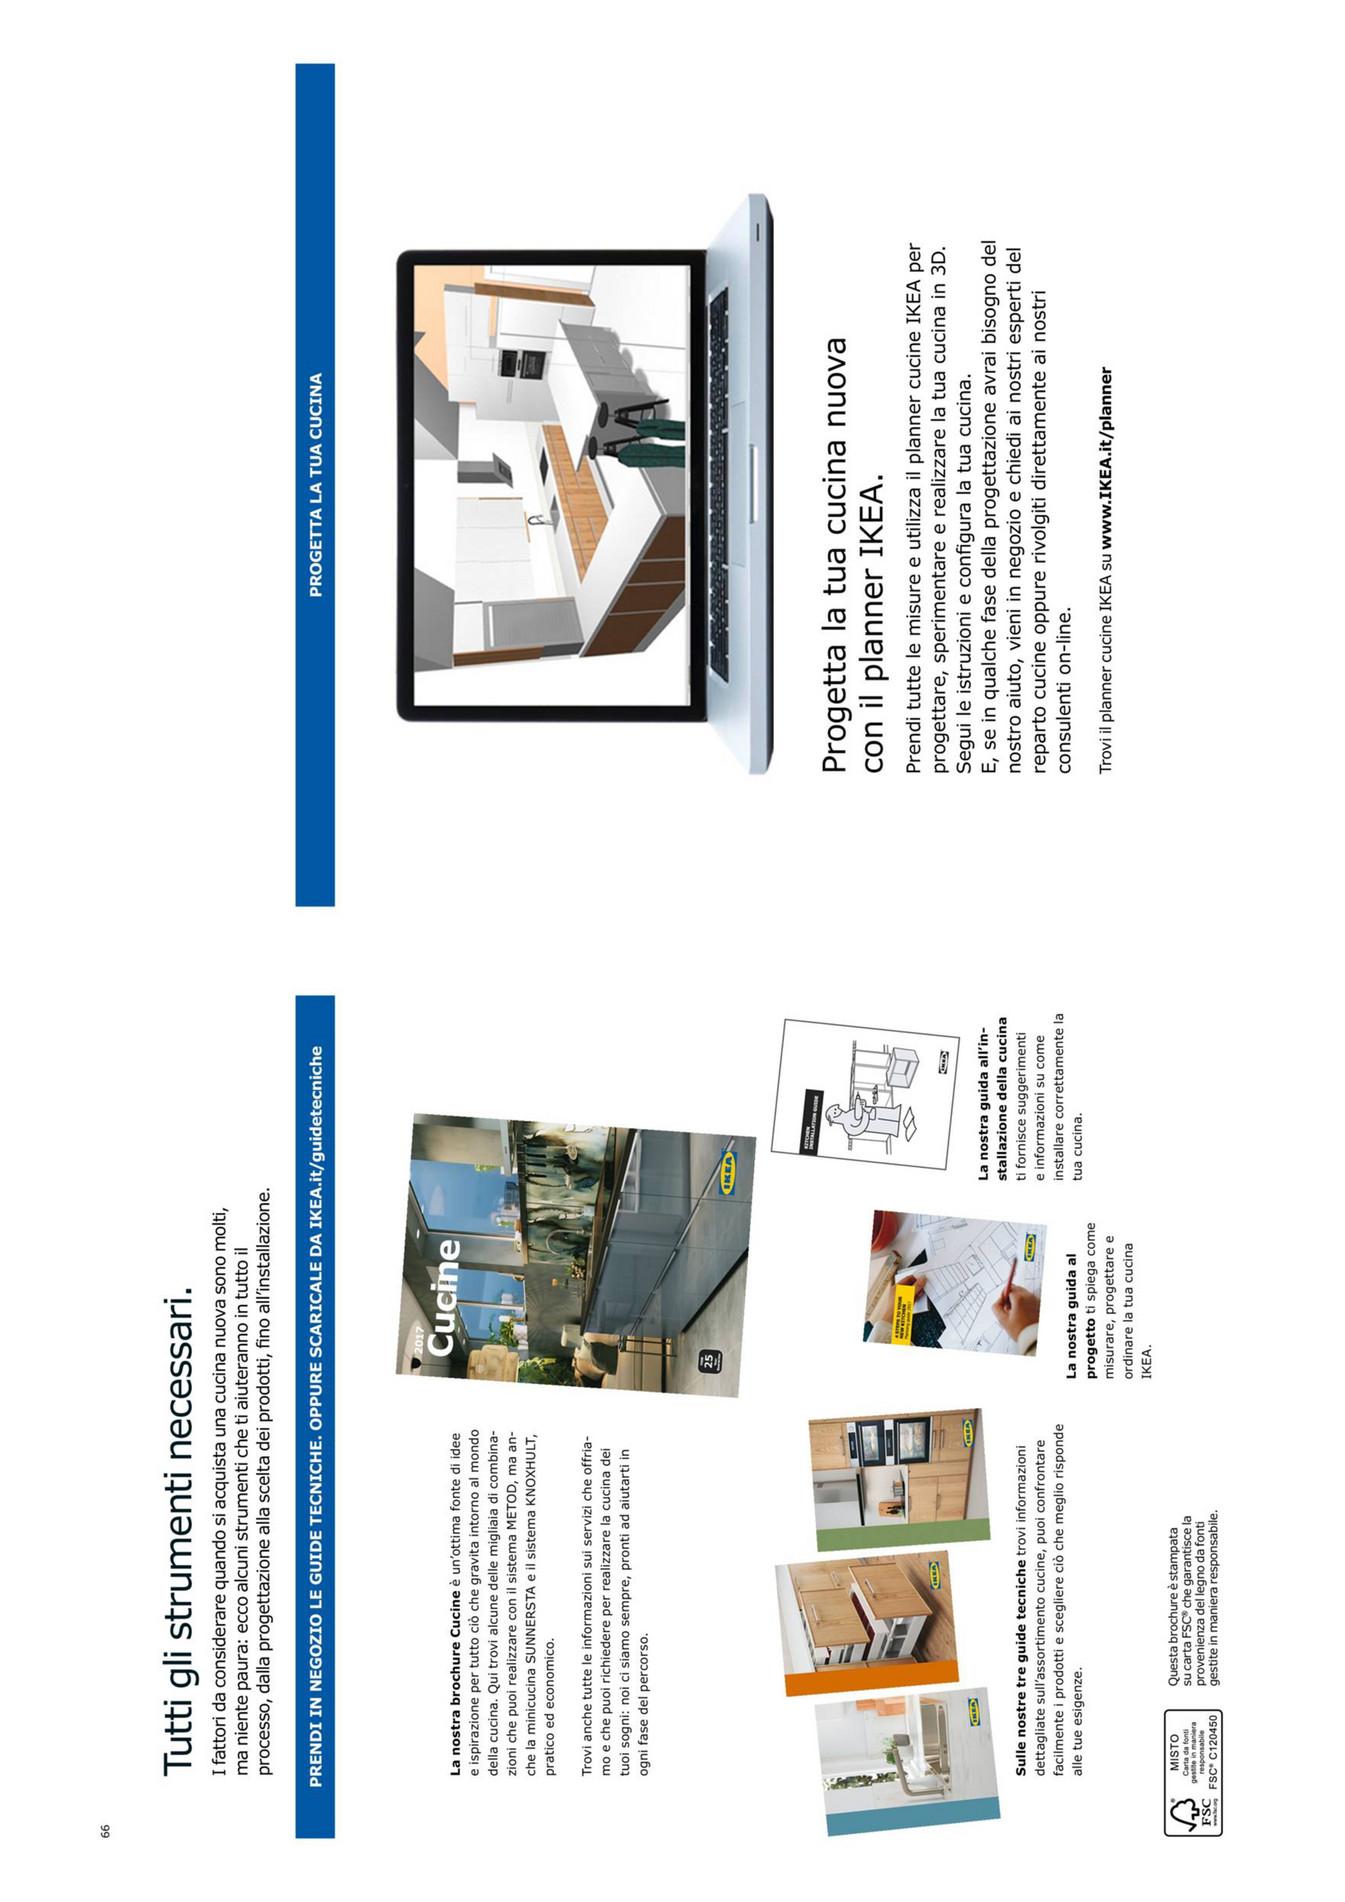 Progetta La Tua Cucina Ikea. Affordable Cucina Acciaio Ikea Come ...